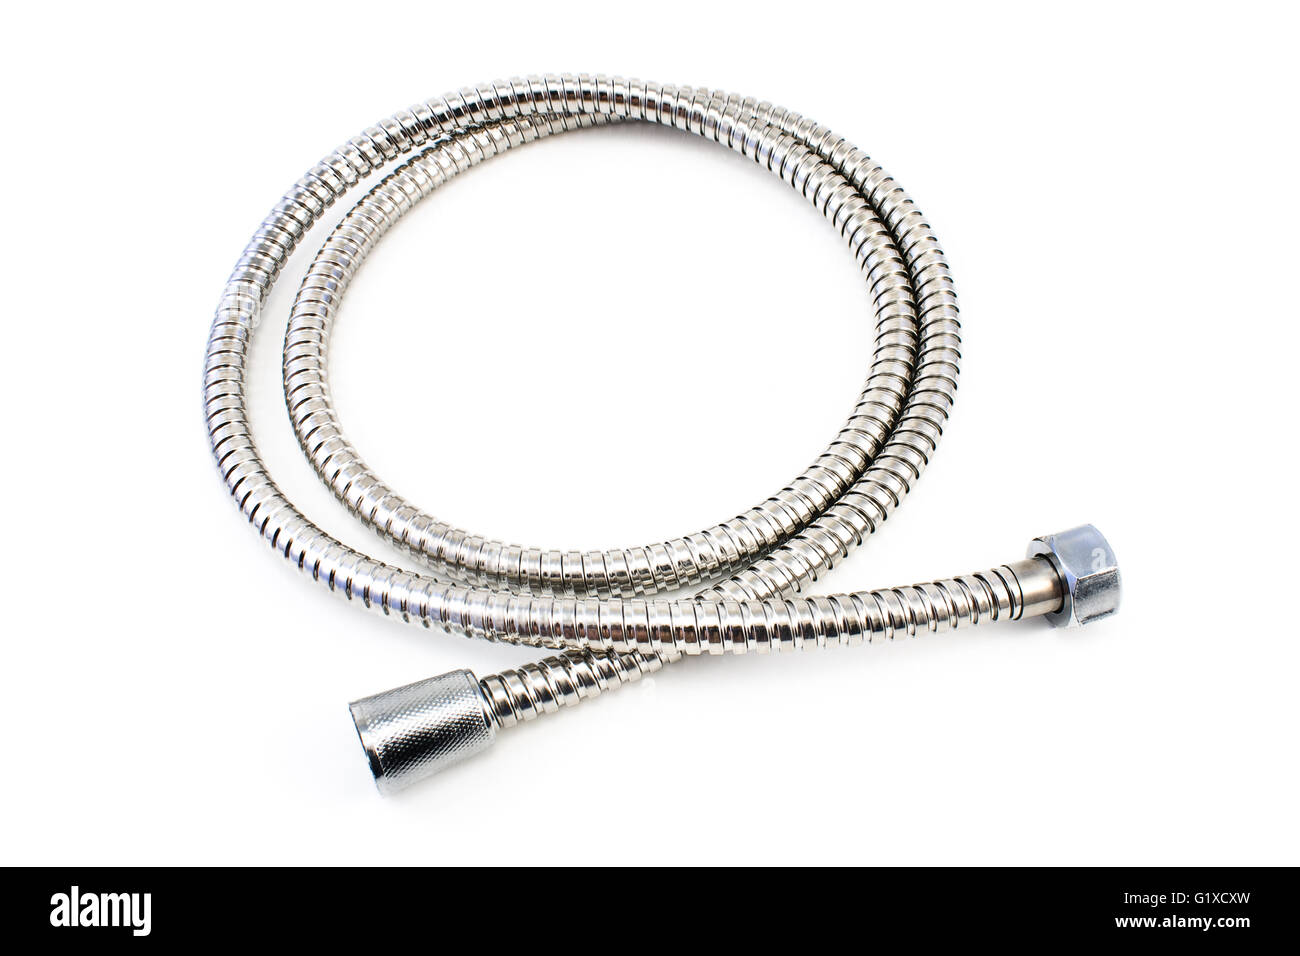 Water hose isolated on white - Stock Image